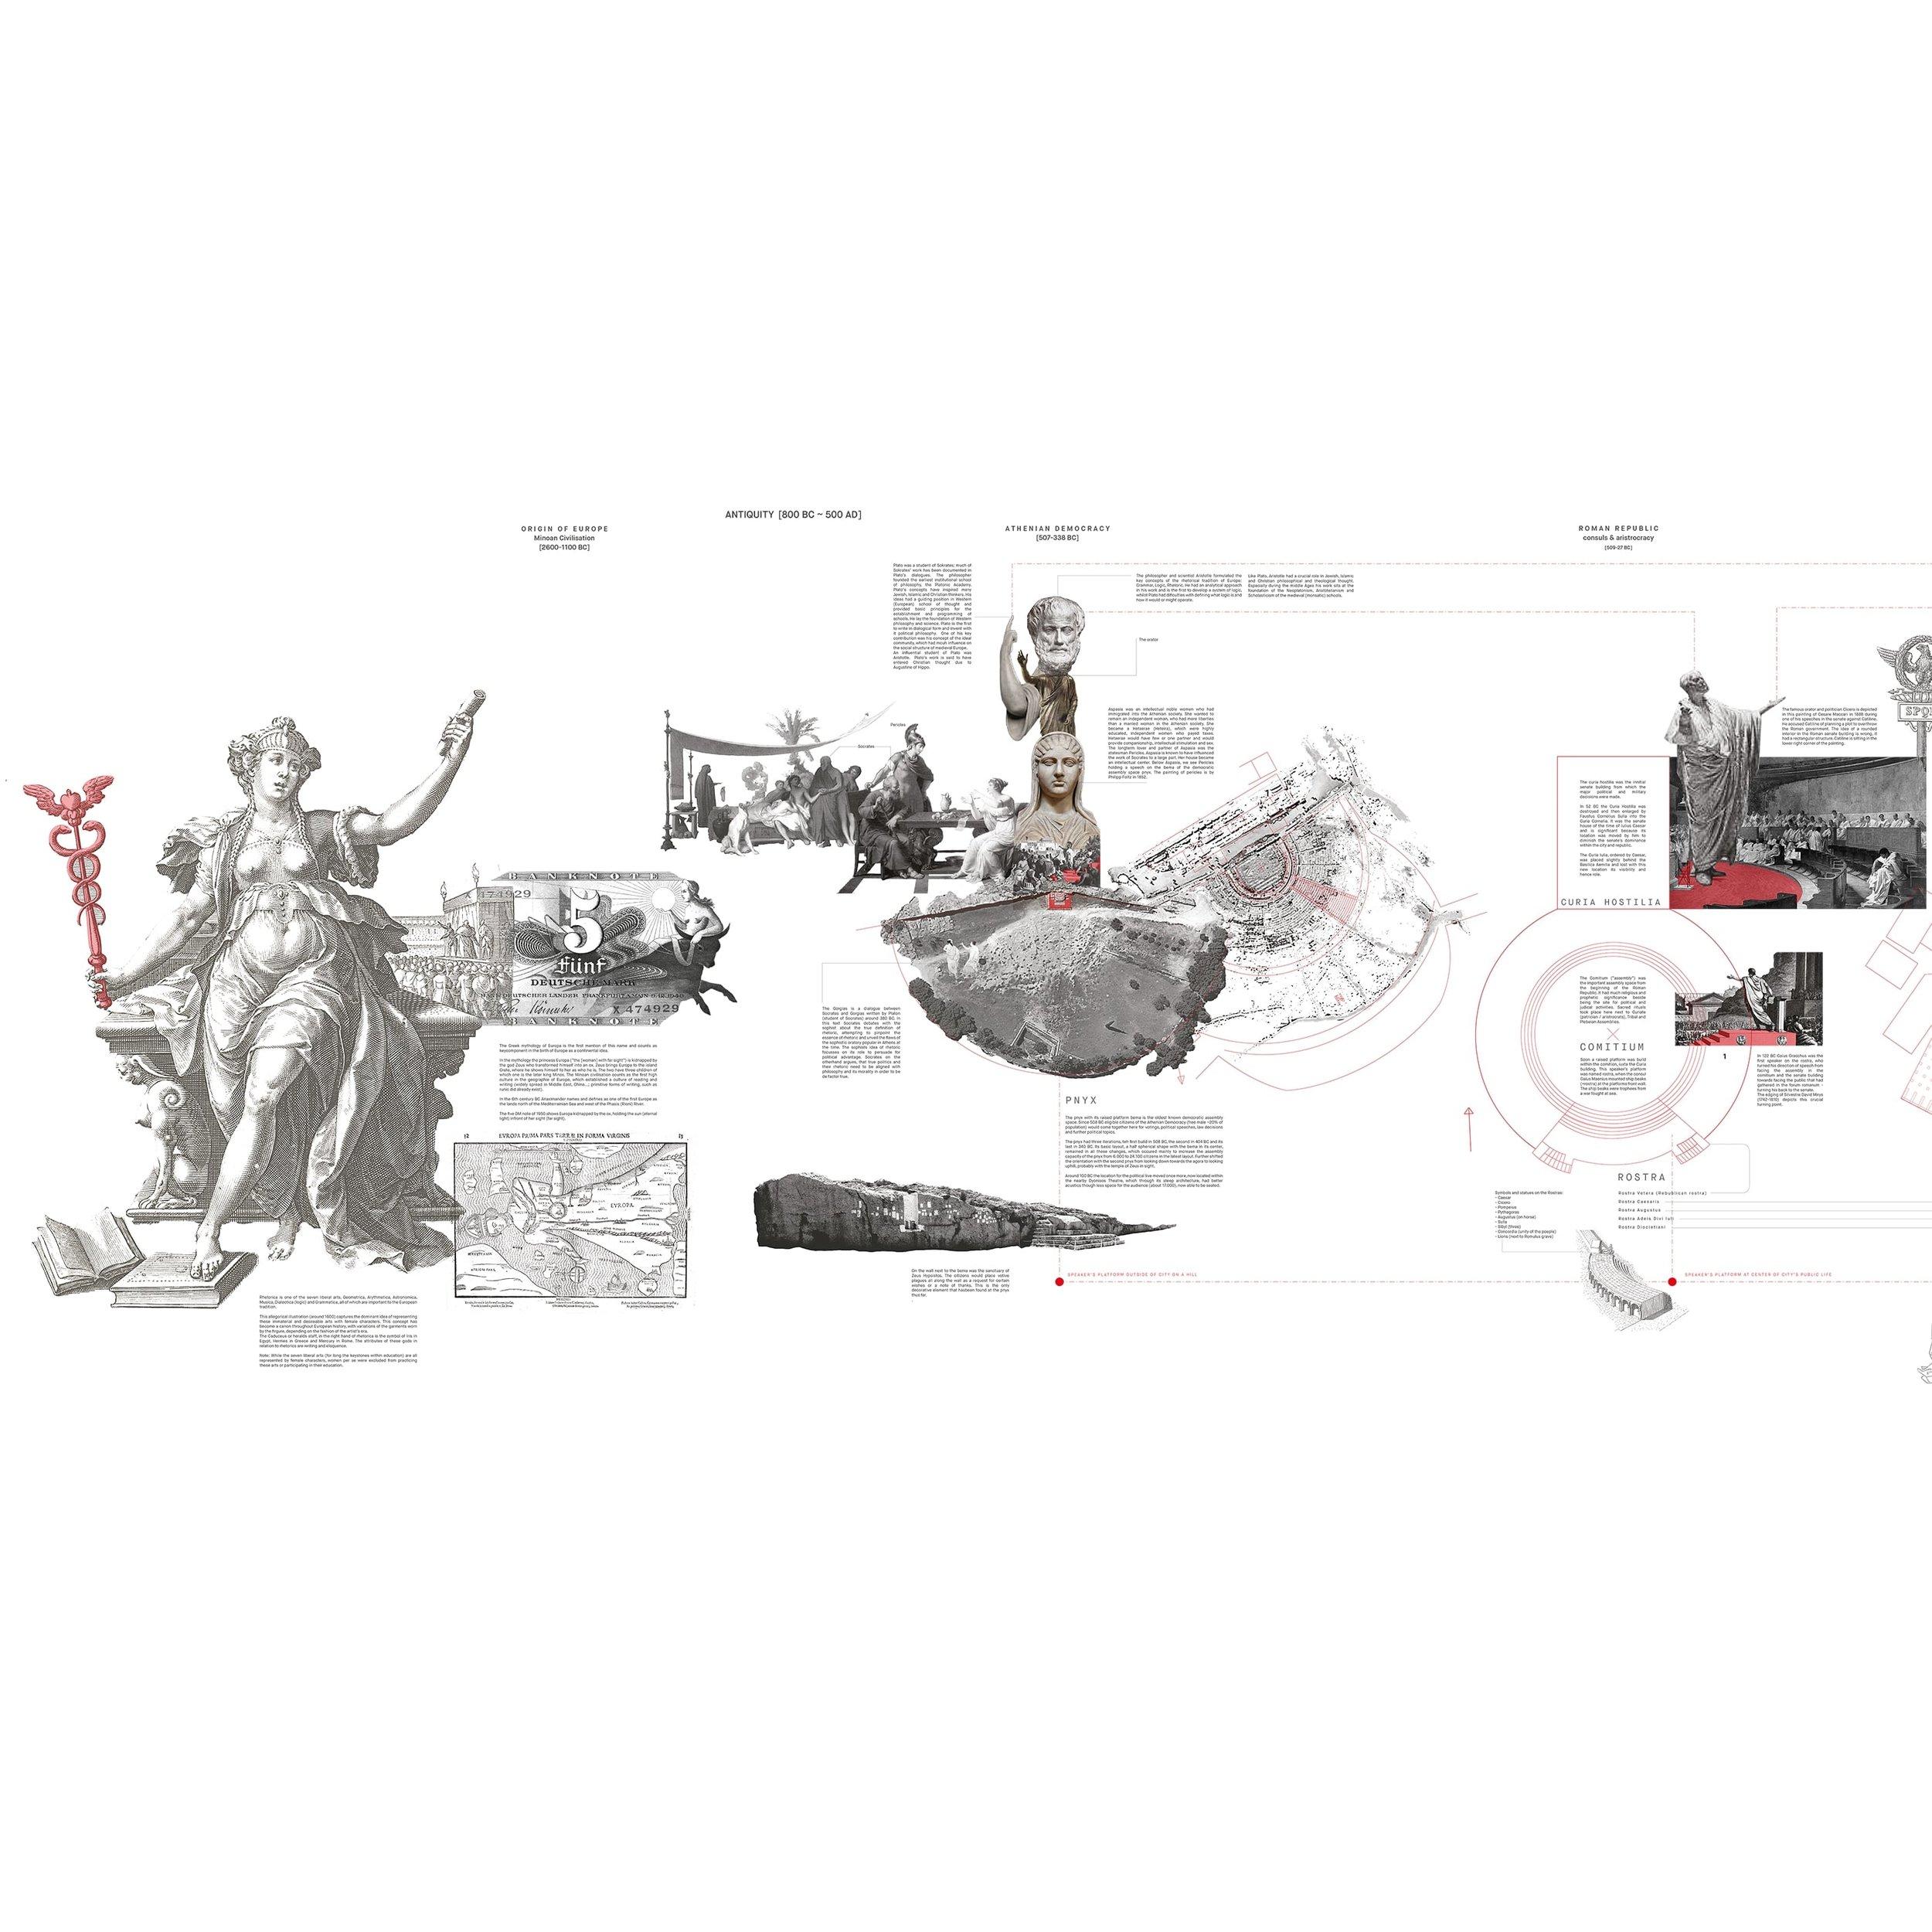 RED_Orebro_Timeline Podium-Rhetoric.compressed copy.jpg